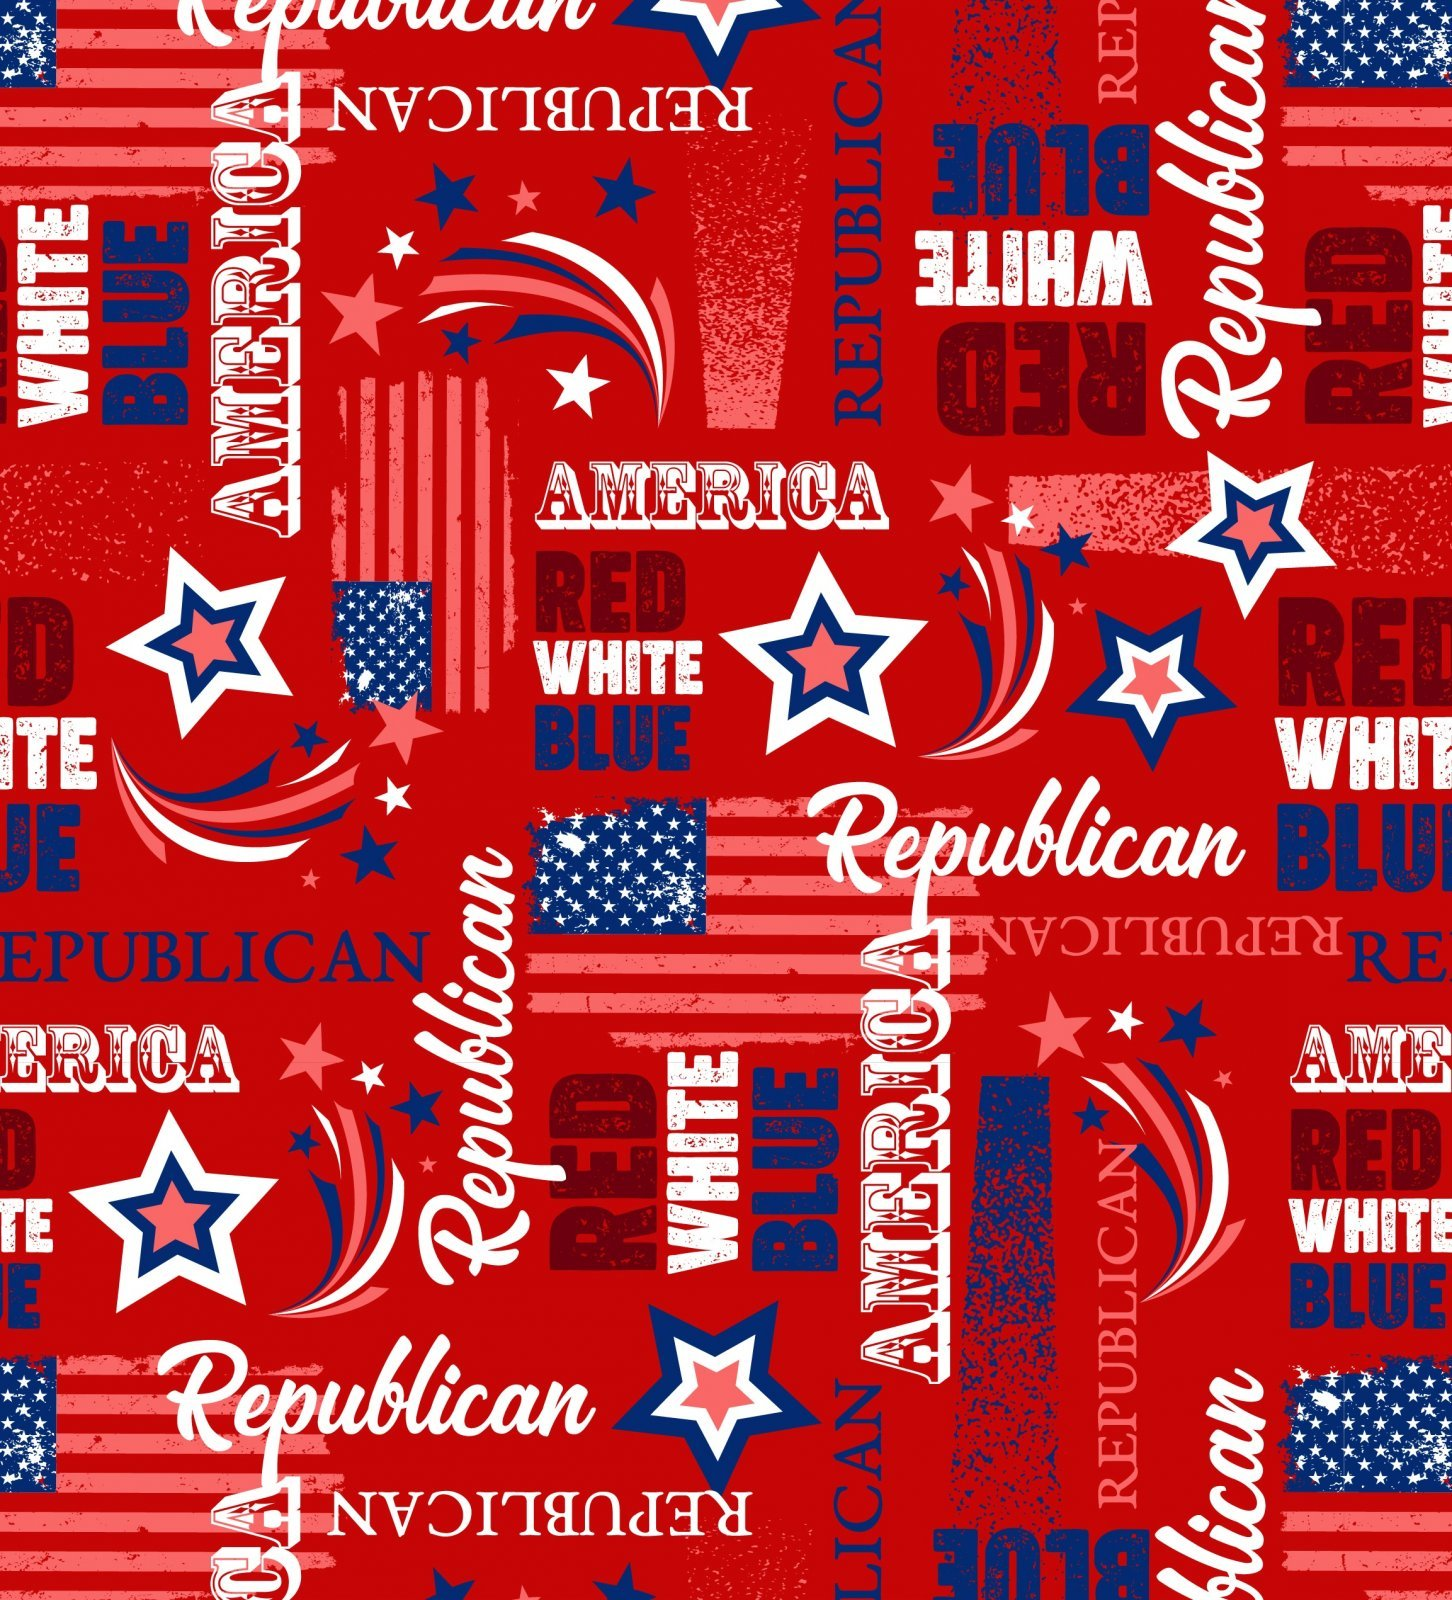 American Republican 2073 Red